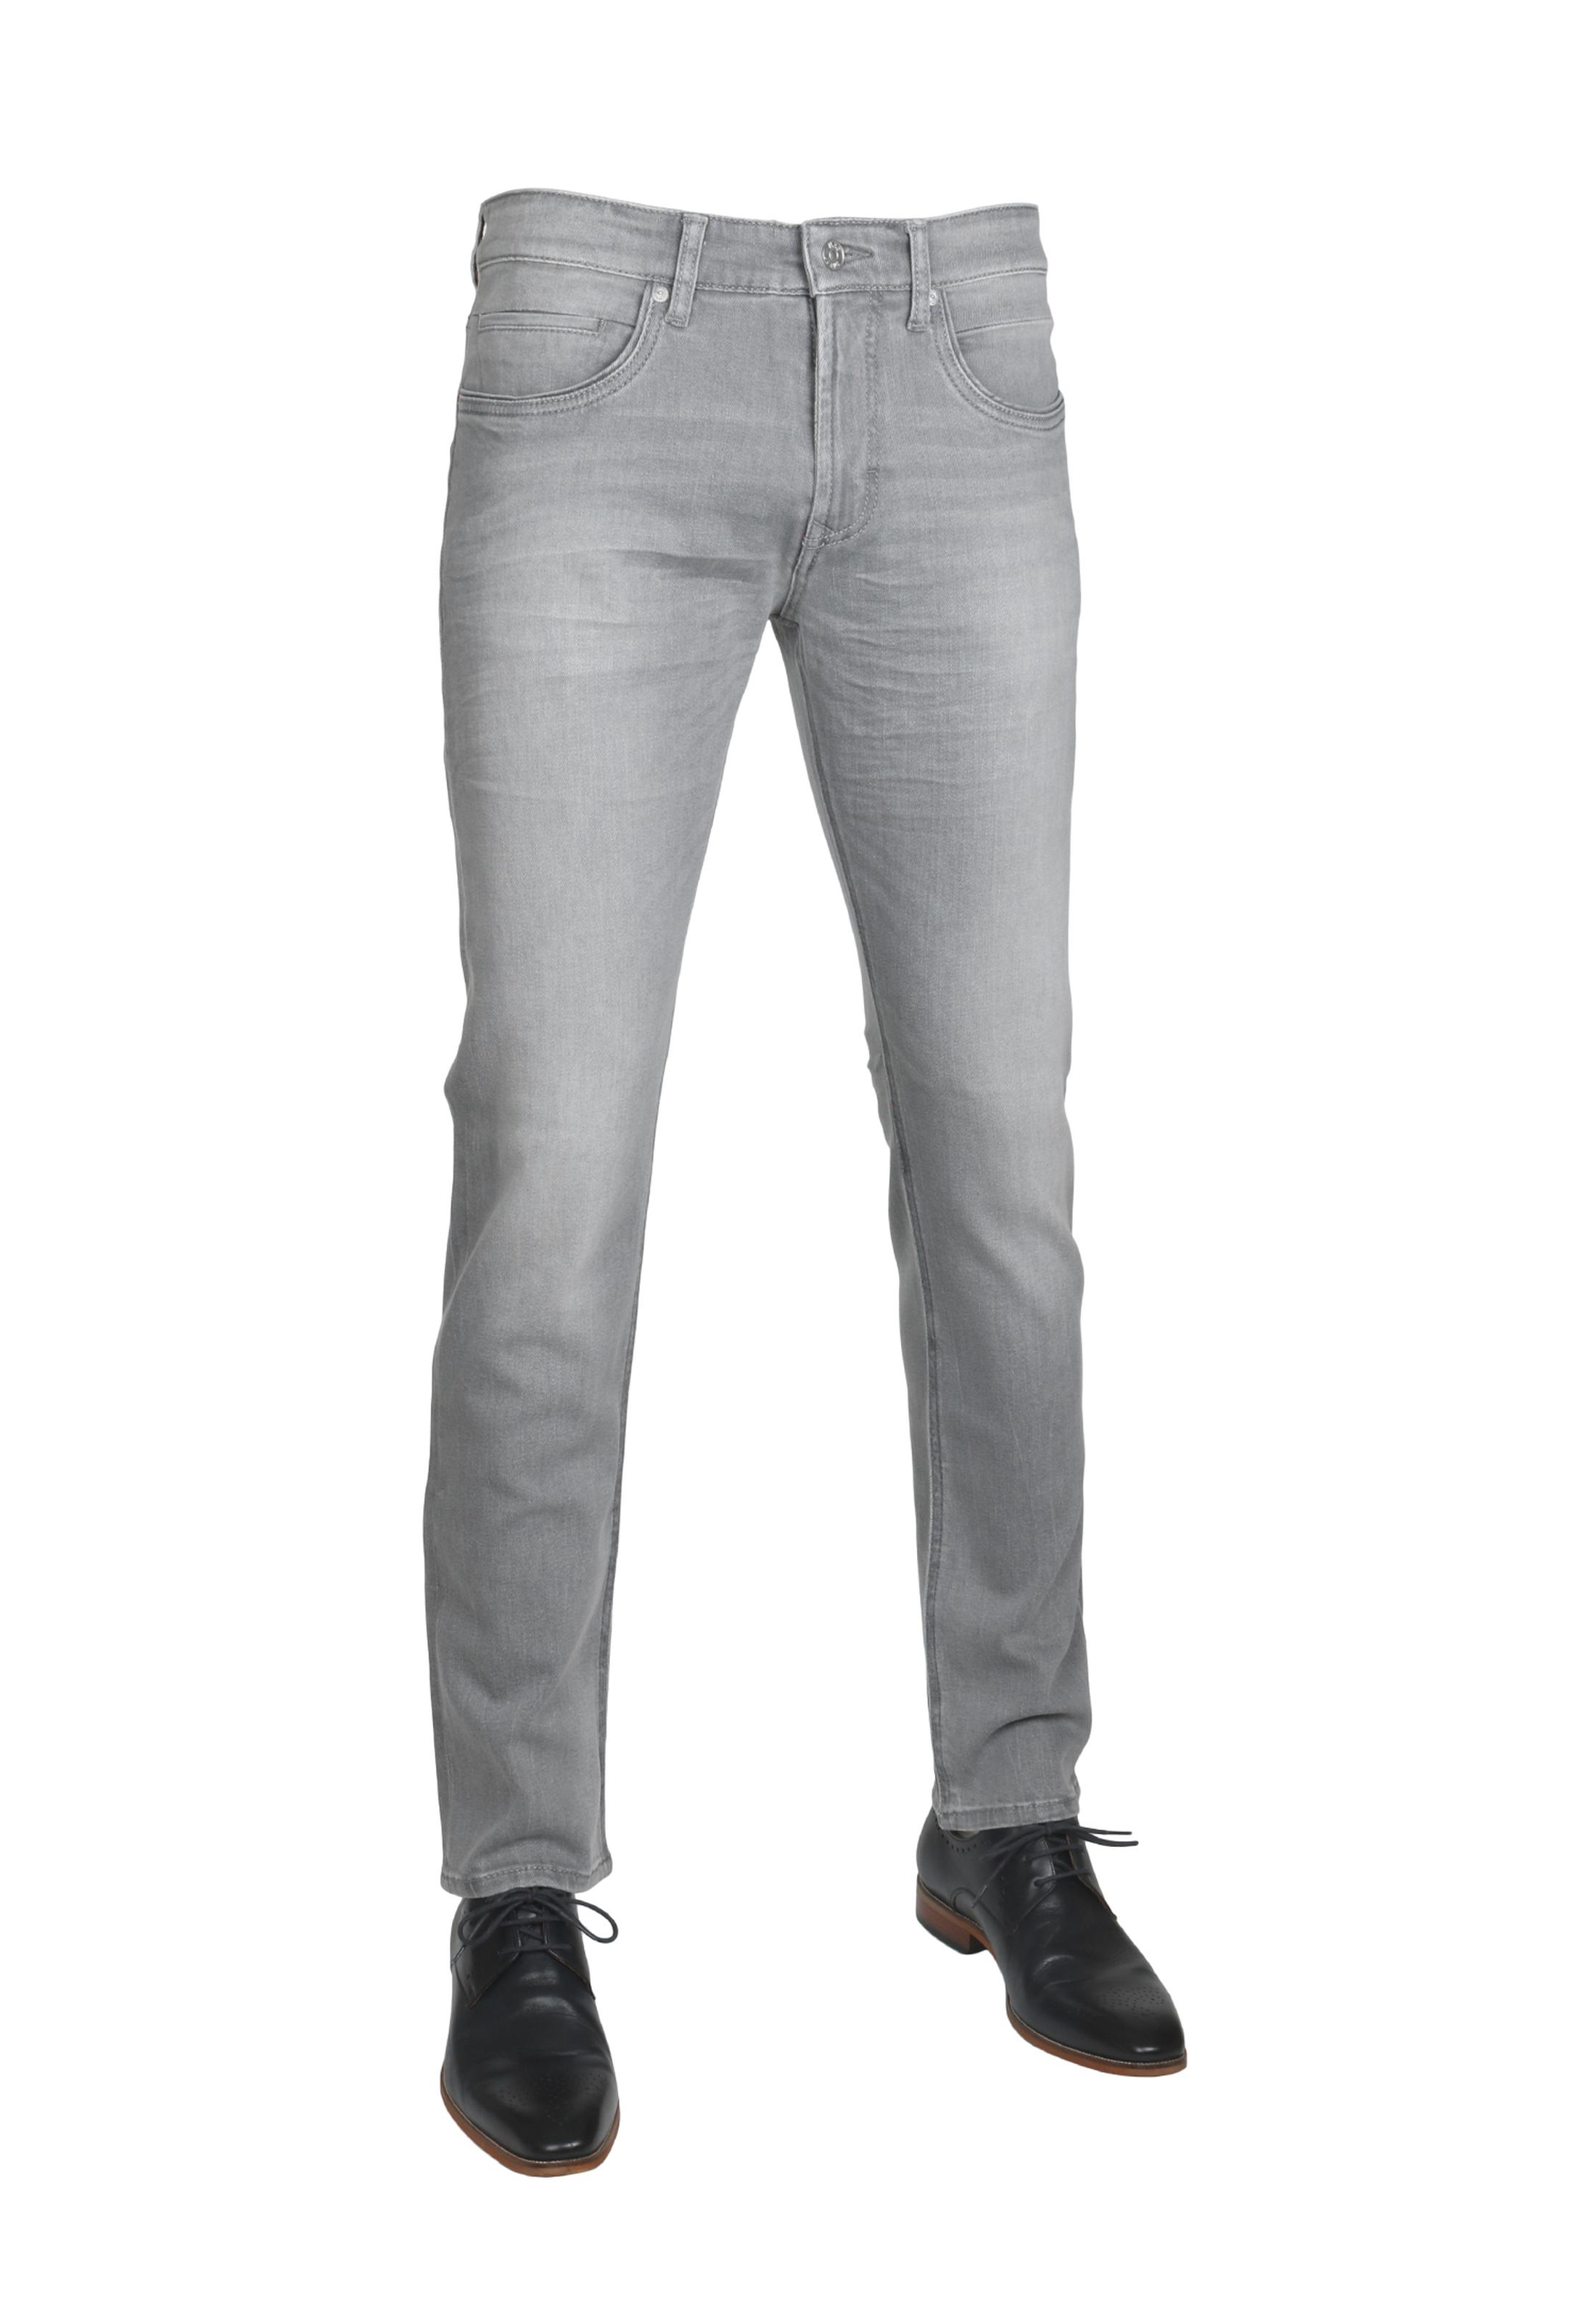 mac jeans arne grijs h819 0517 00 1973l online bestellen suitable. Black Bedroom Furniture Sets. Home Design Ideas